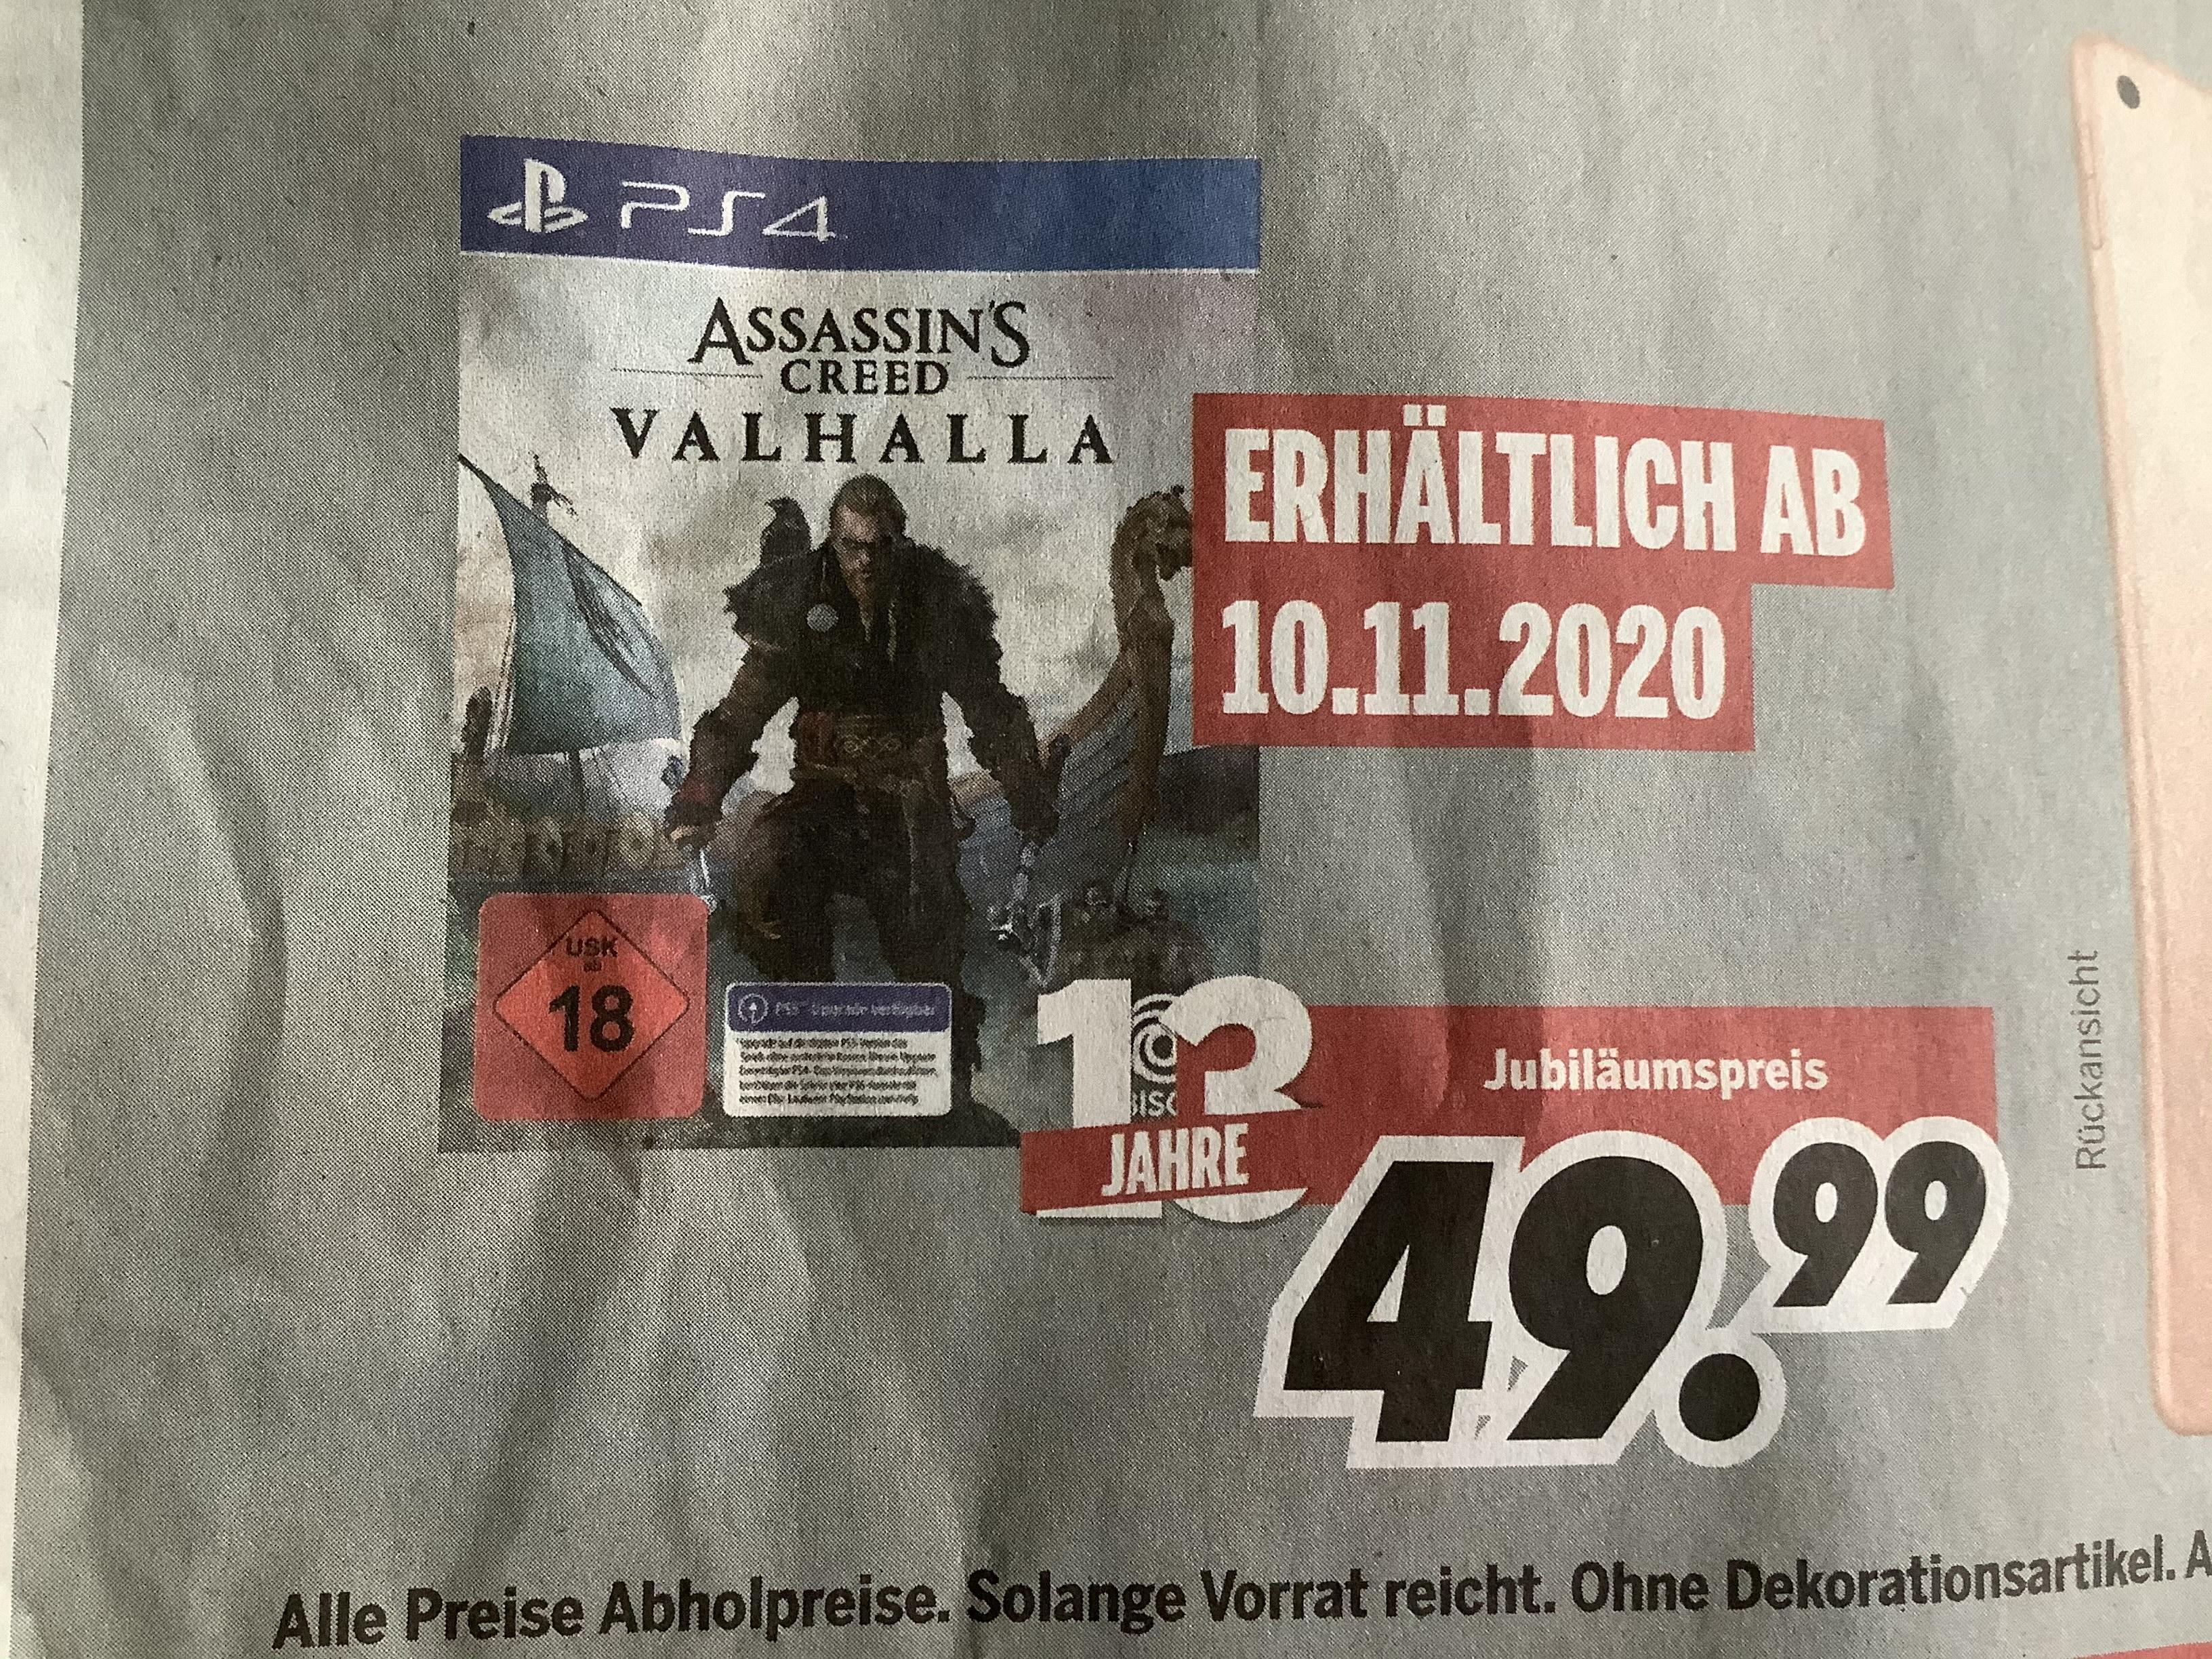 Lokal Assaissins Creed Valhalla PS4 inkl. PS5 Upgrade Medimax Strausberg 10.11.2020